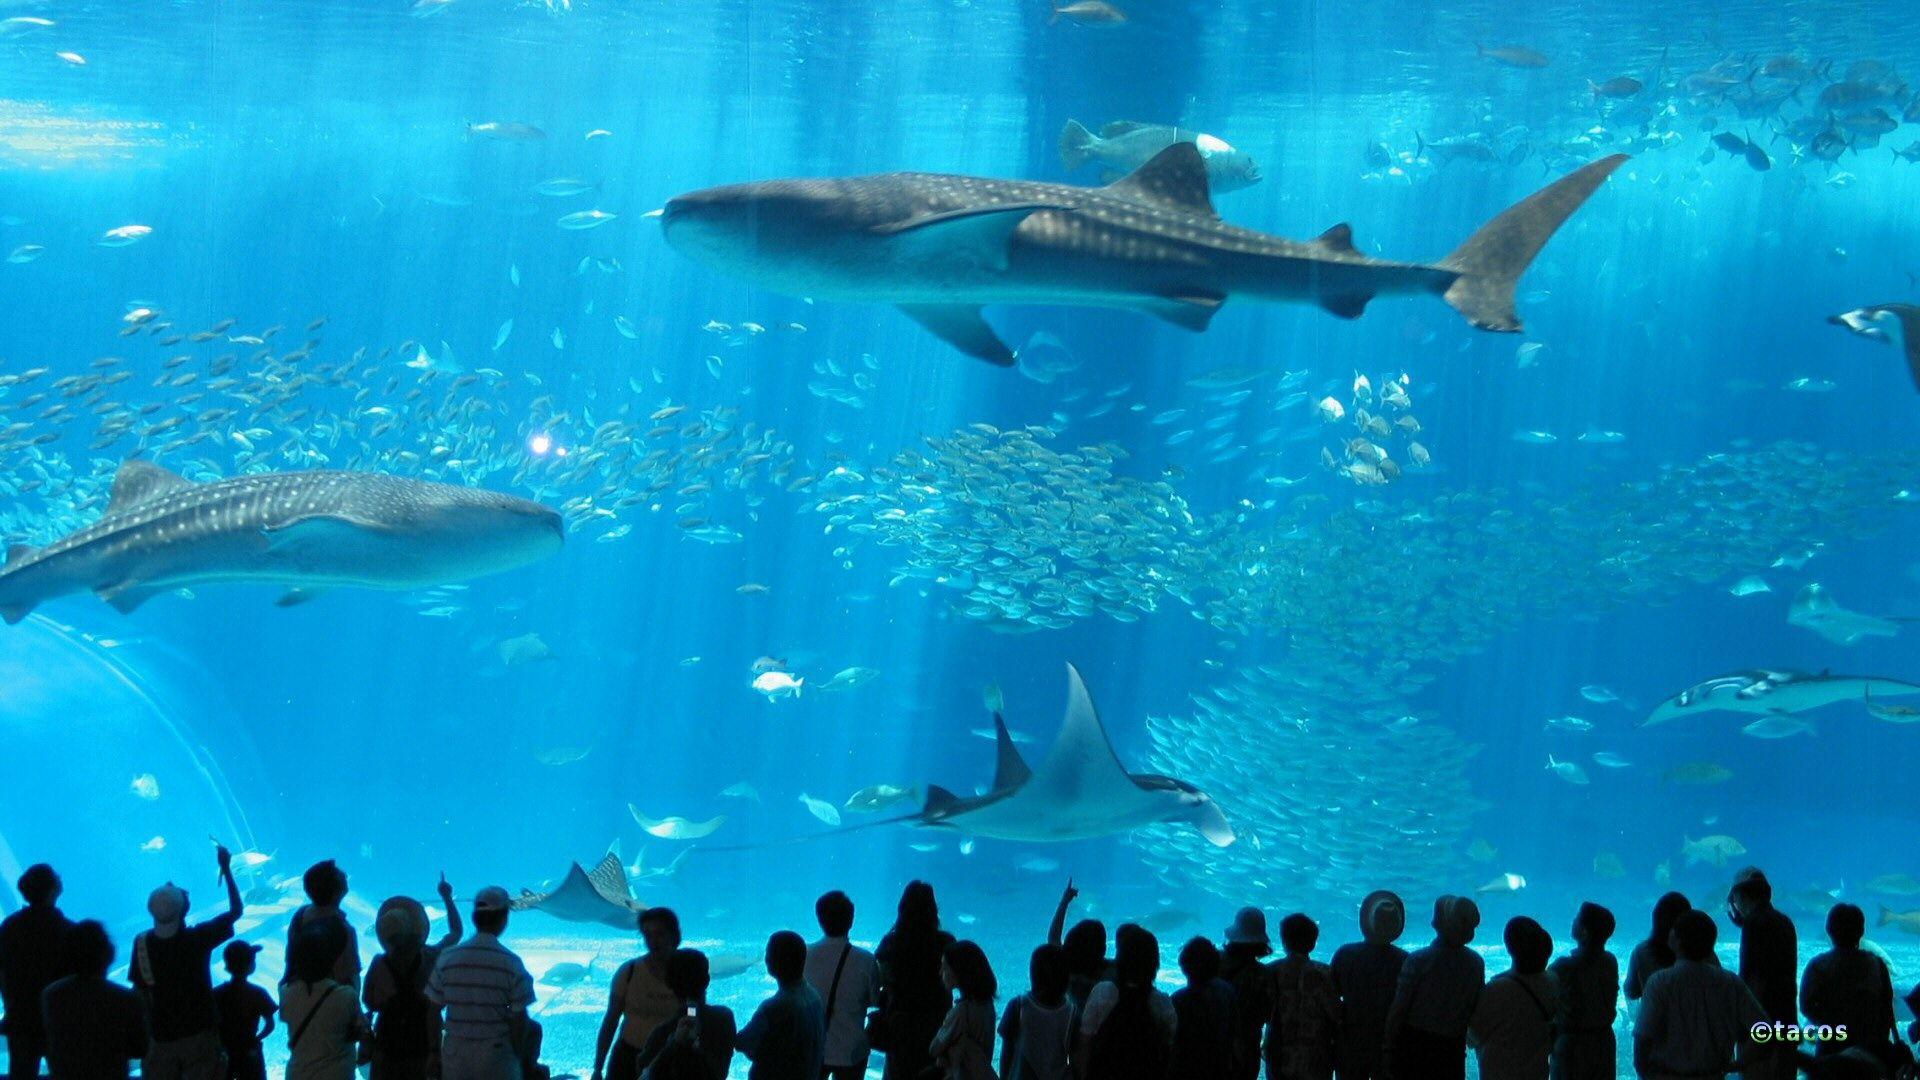 Okinawa Churaumi Aquarium In Japan I Believe It S The Largest In The World Okinawa Japan Travel Japan Beach